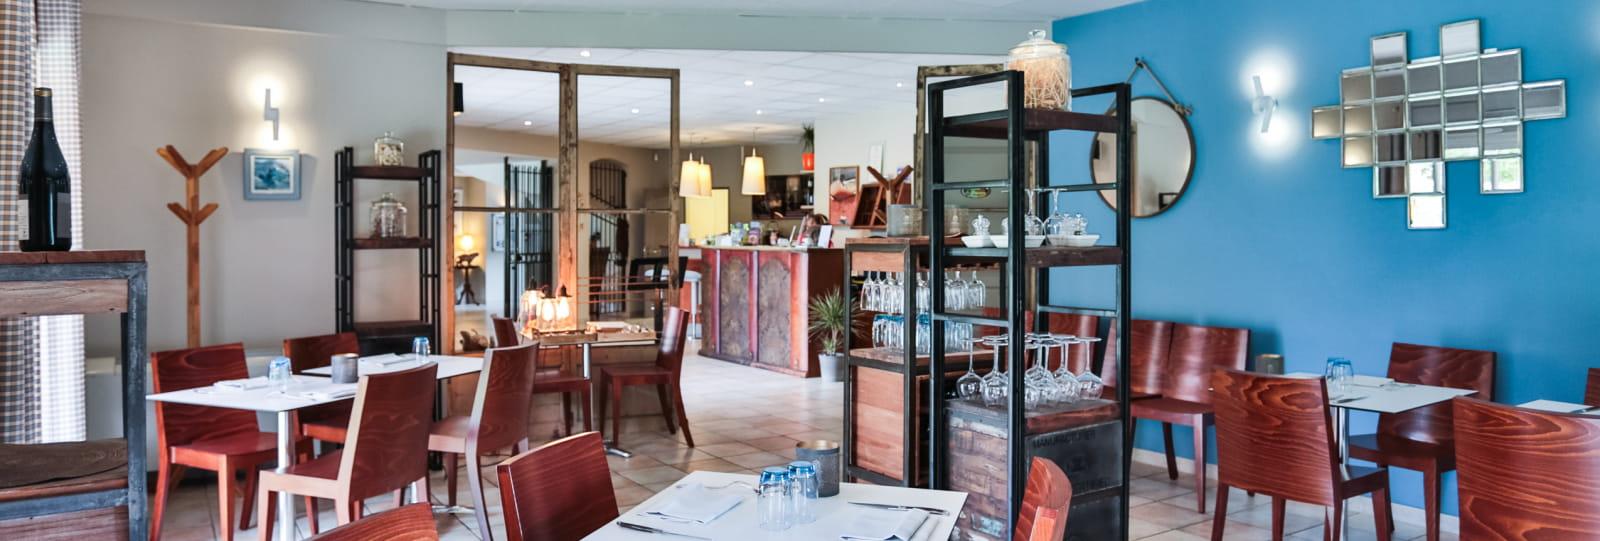 Restaurant - Chez Elles